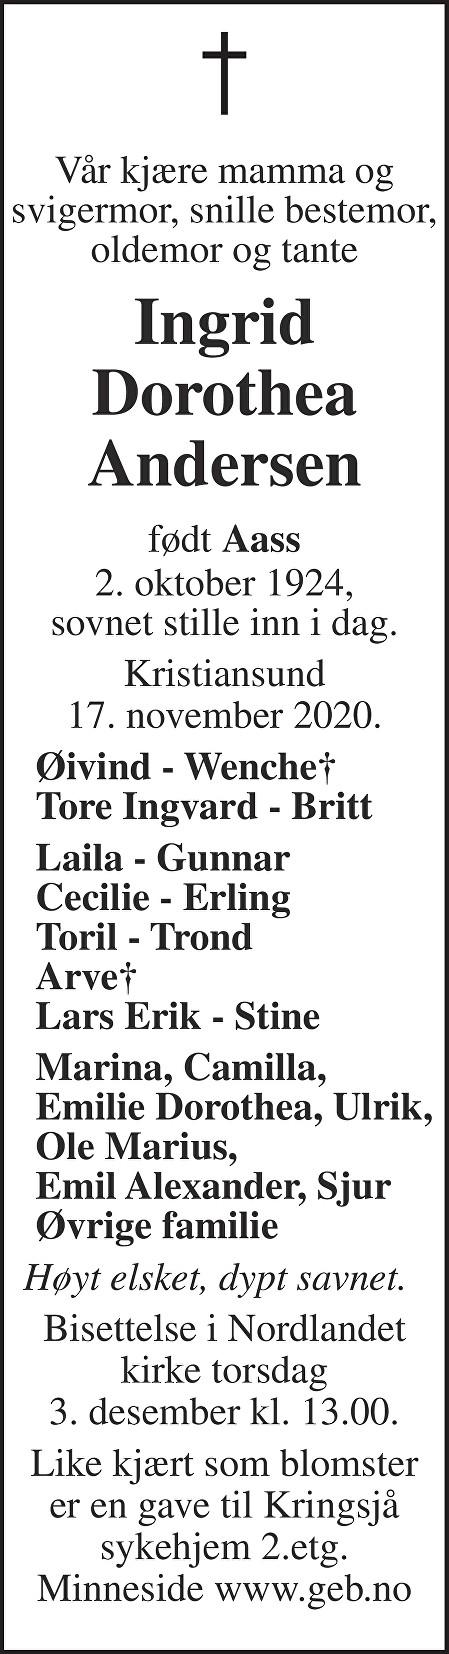 Ingrid Dorothea Andersen Dødsannonse